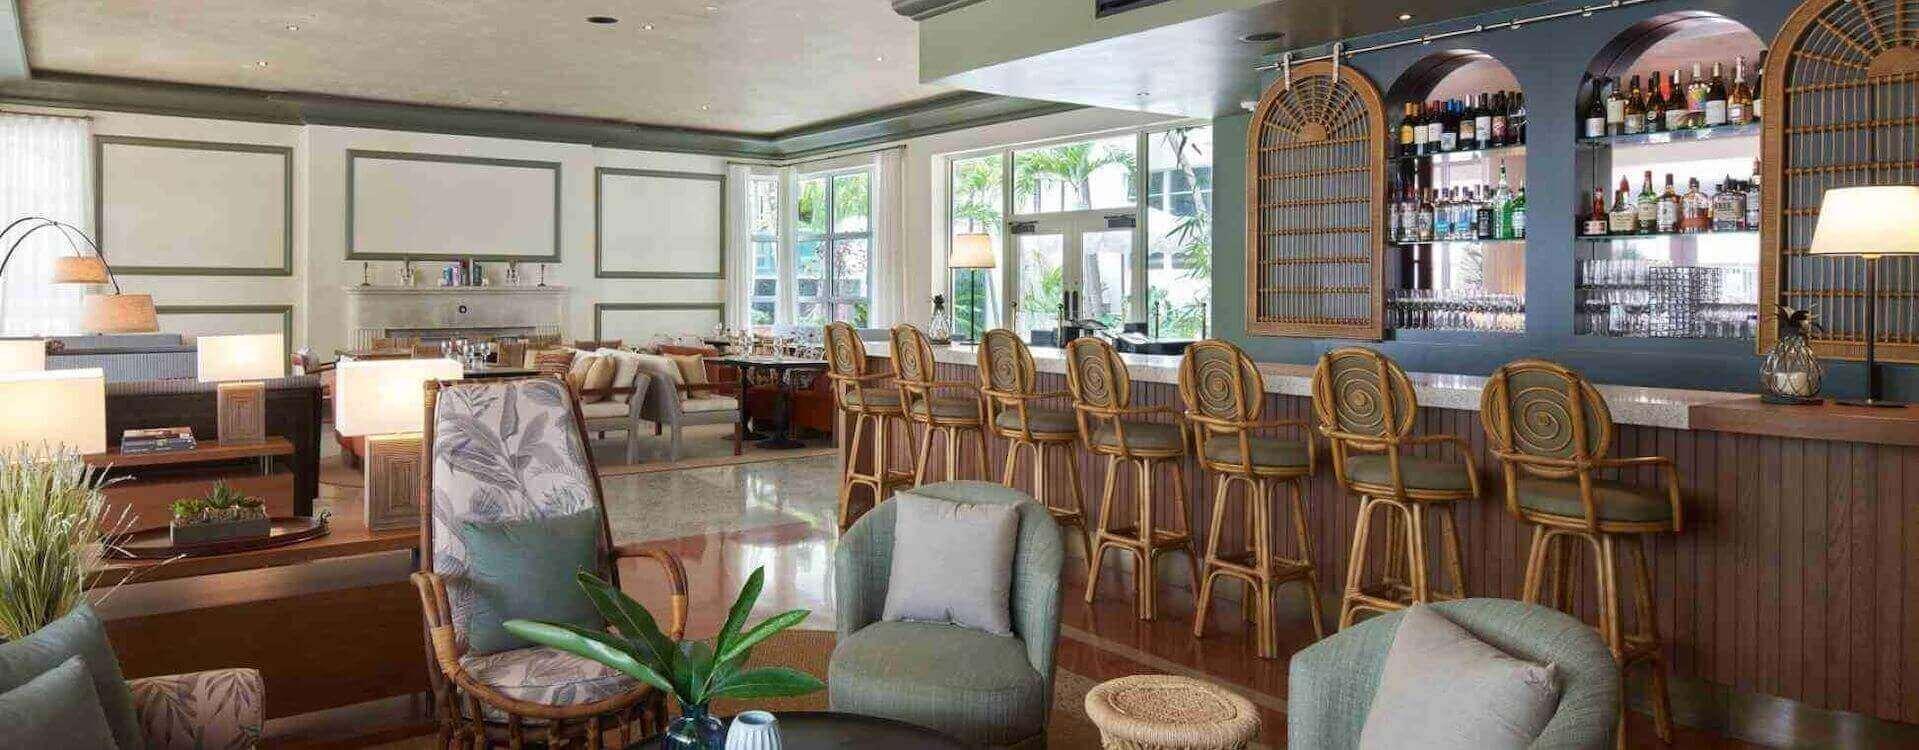 Cafeteria at Balfour Hotel, Miami beach